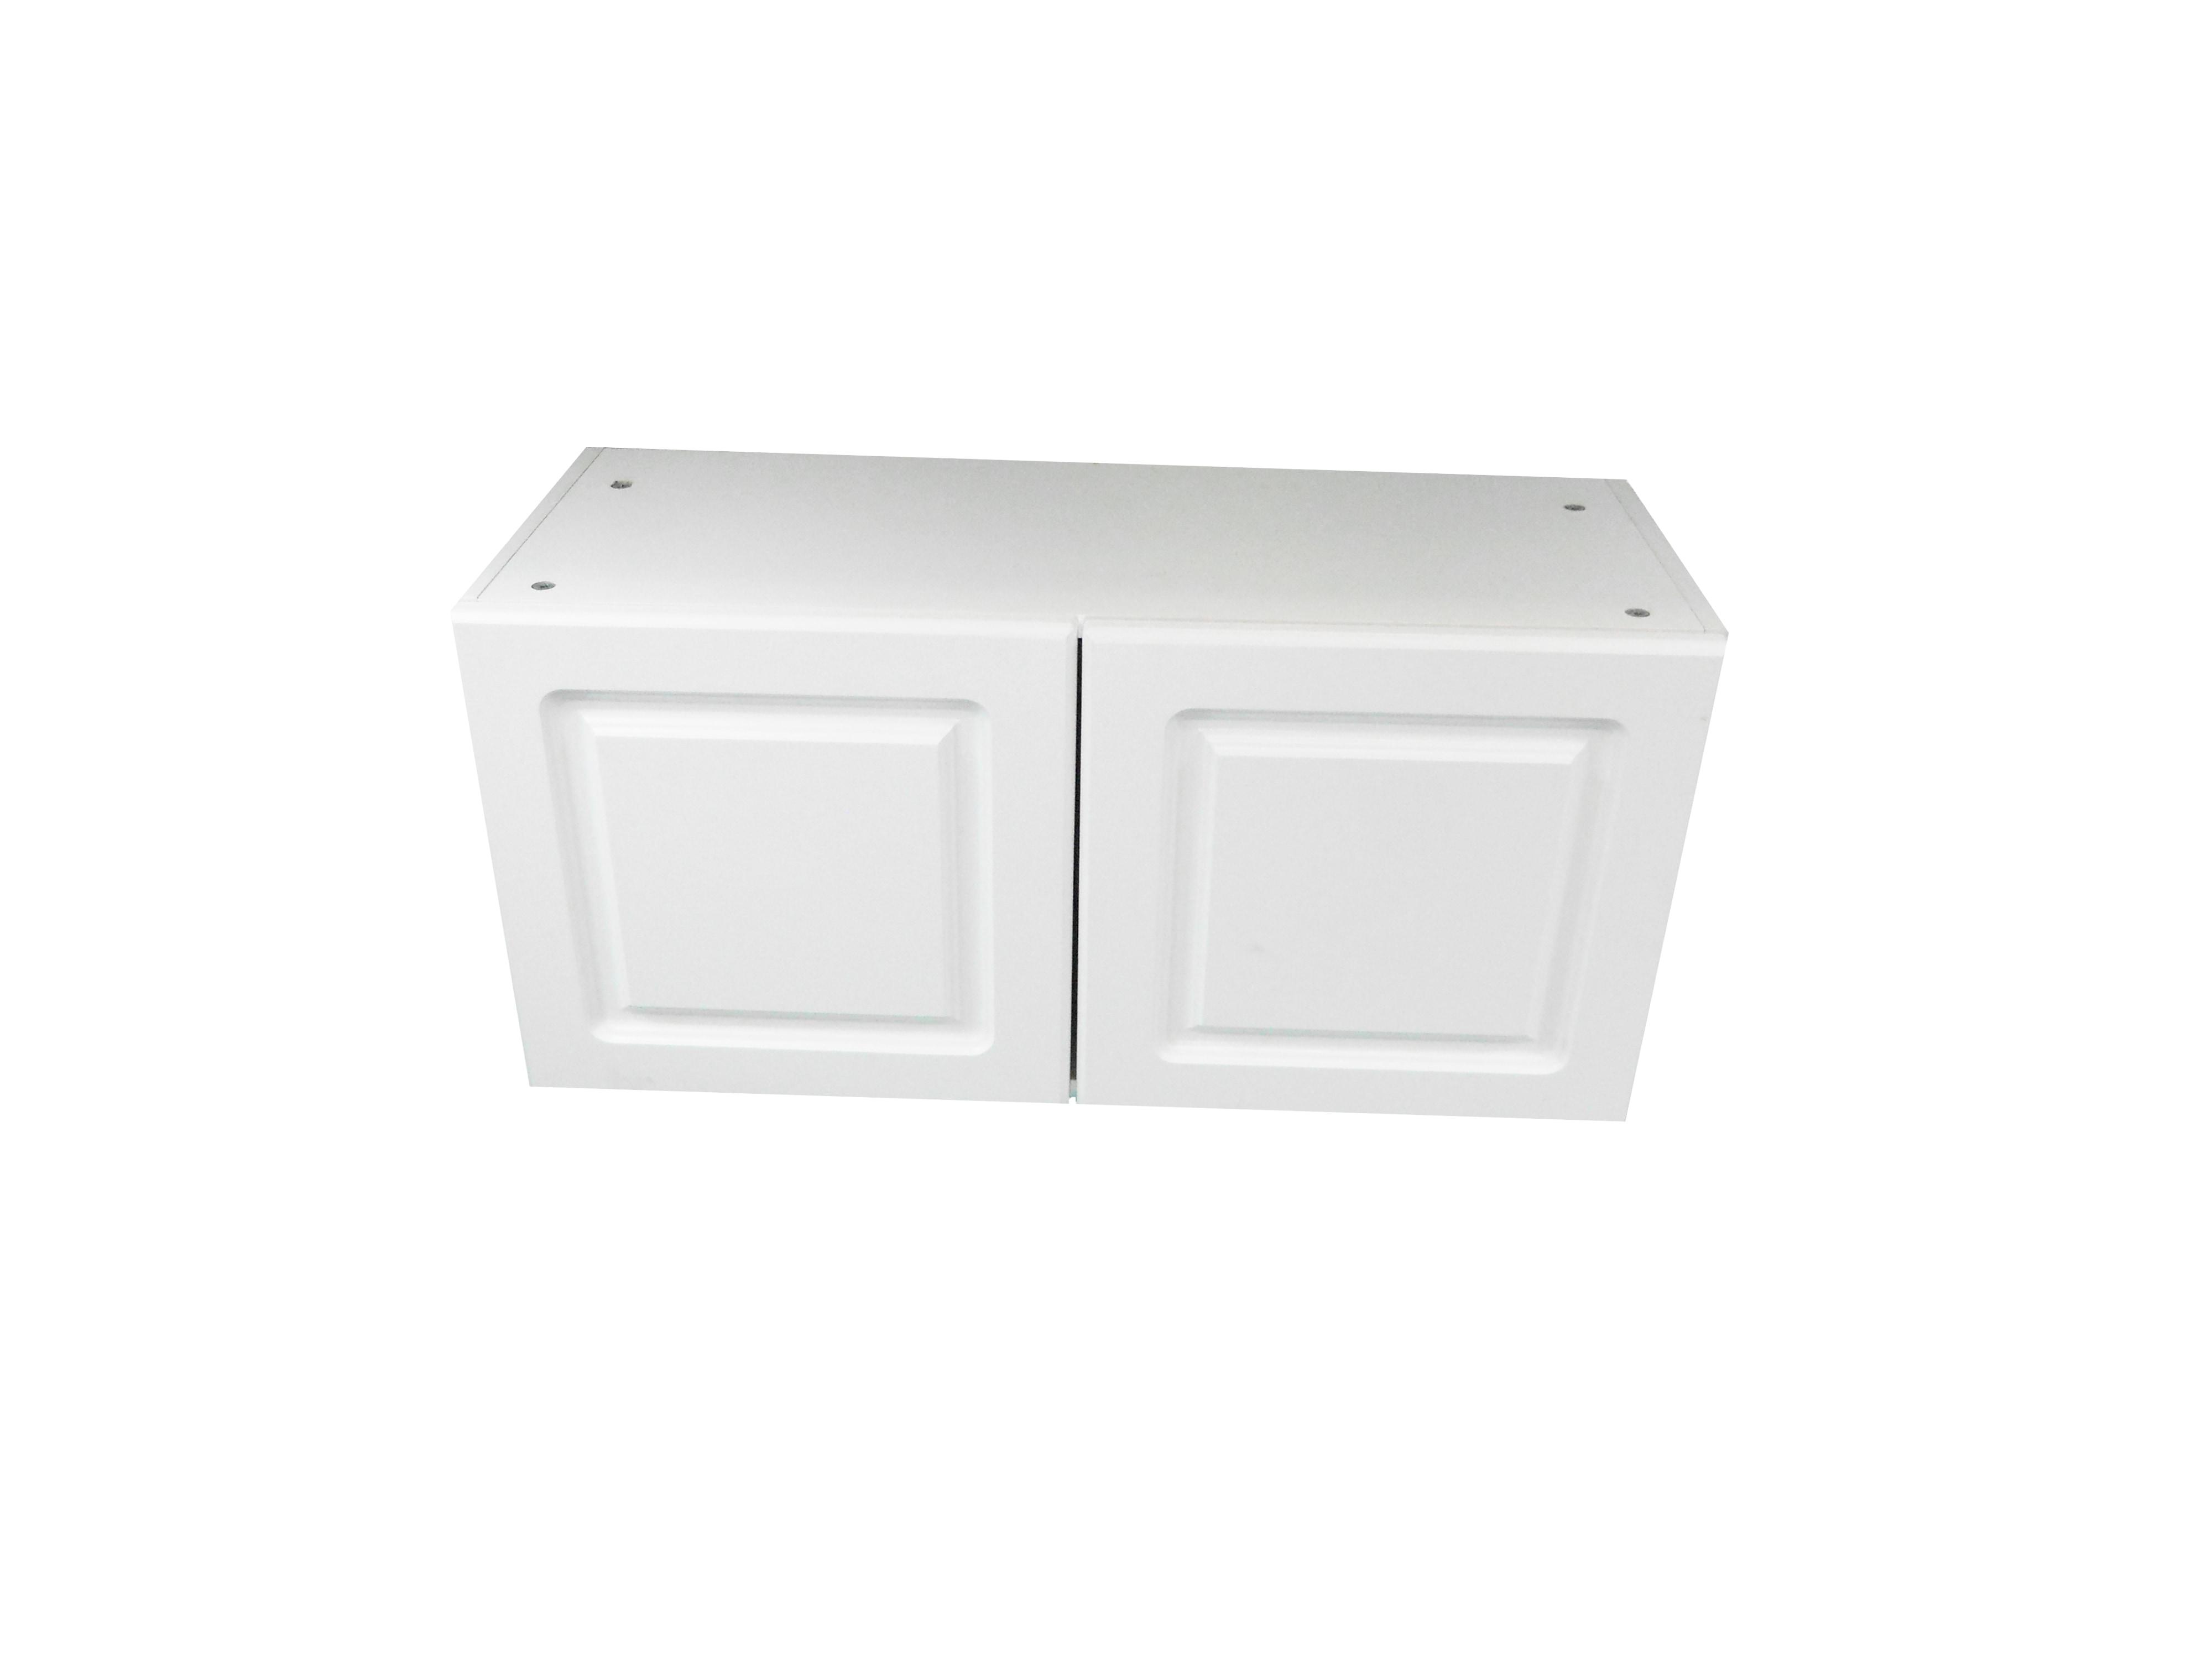 Appliance Wall Cabinet with 2 Doors / San Juan / Raised Panel White / 30x12 San Juan 0